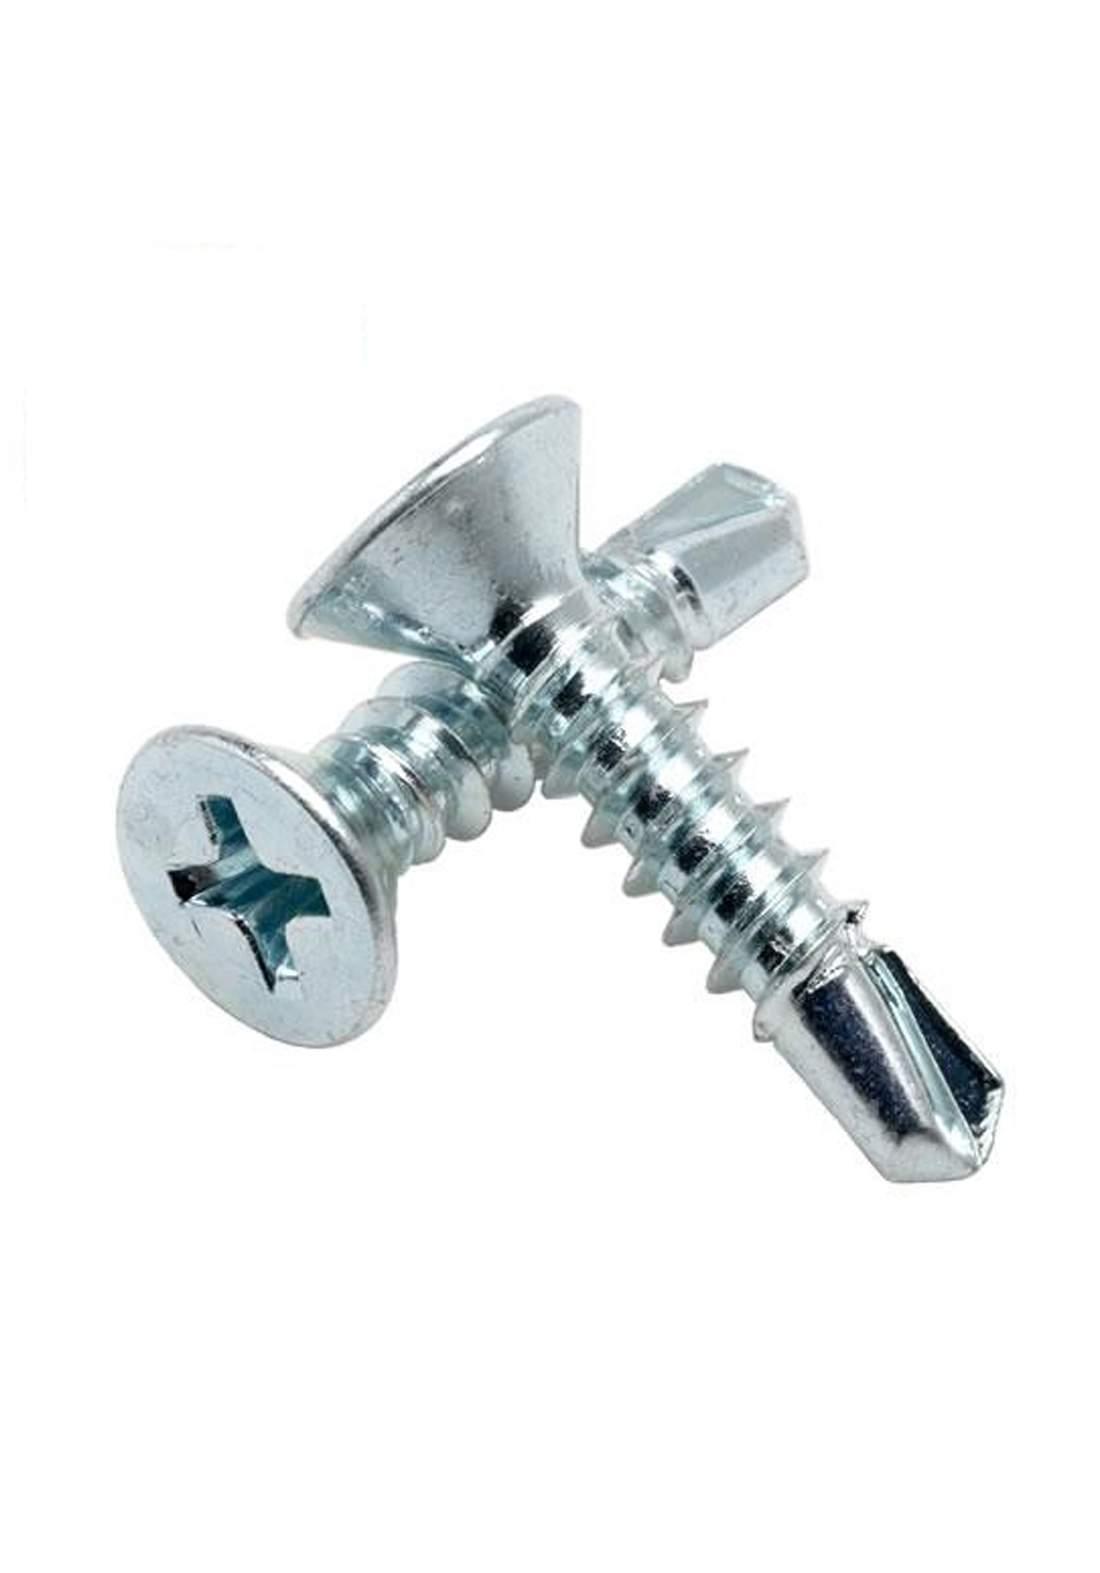 Patta Self Drilling Screw Flat Phillips 4.2*38 mm برغي فيليبس